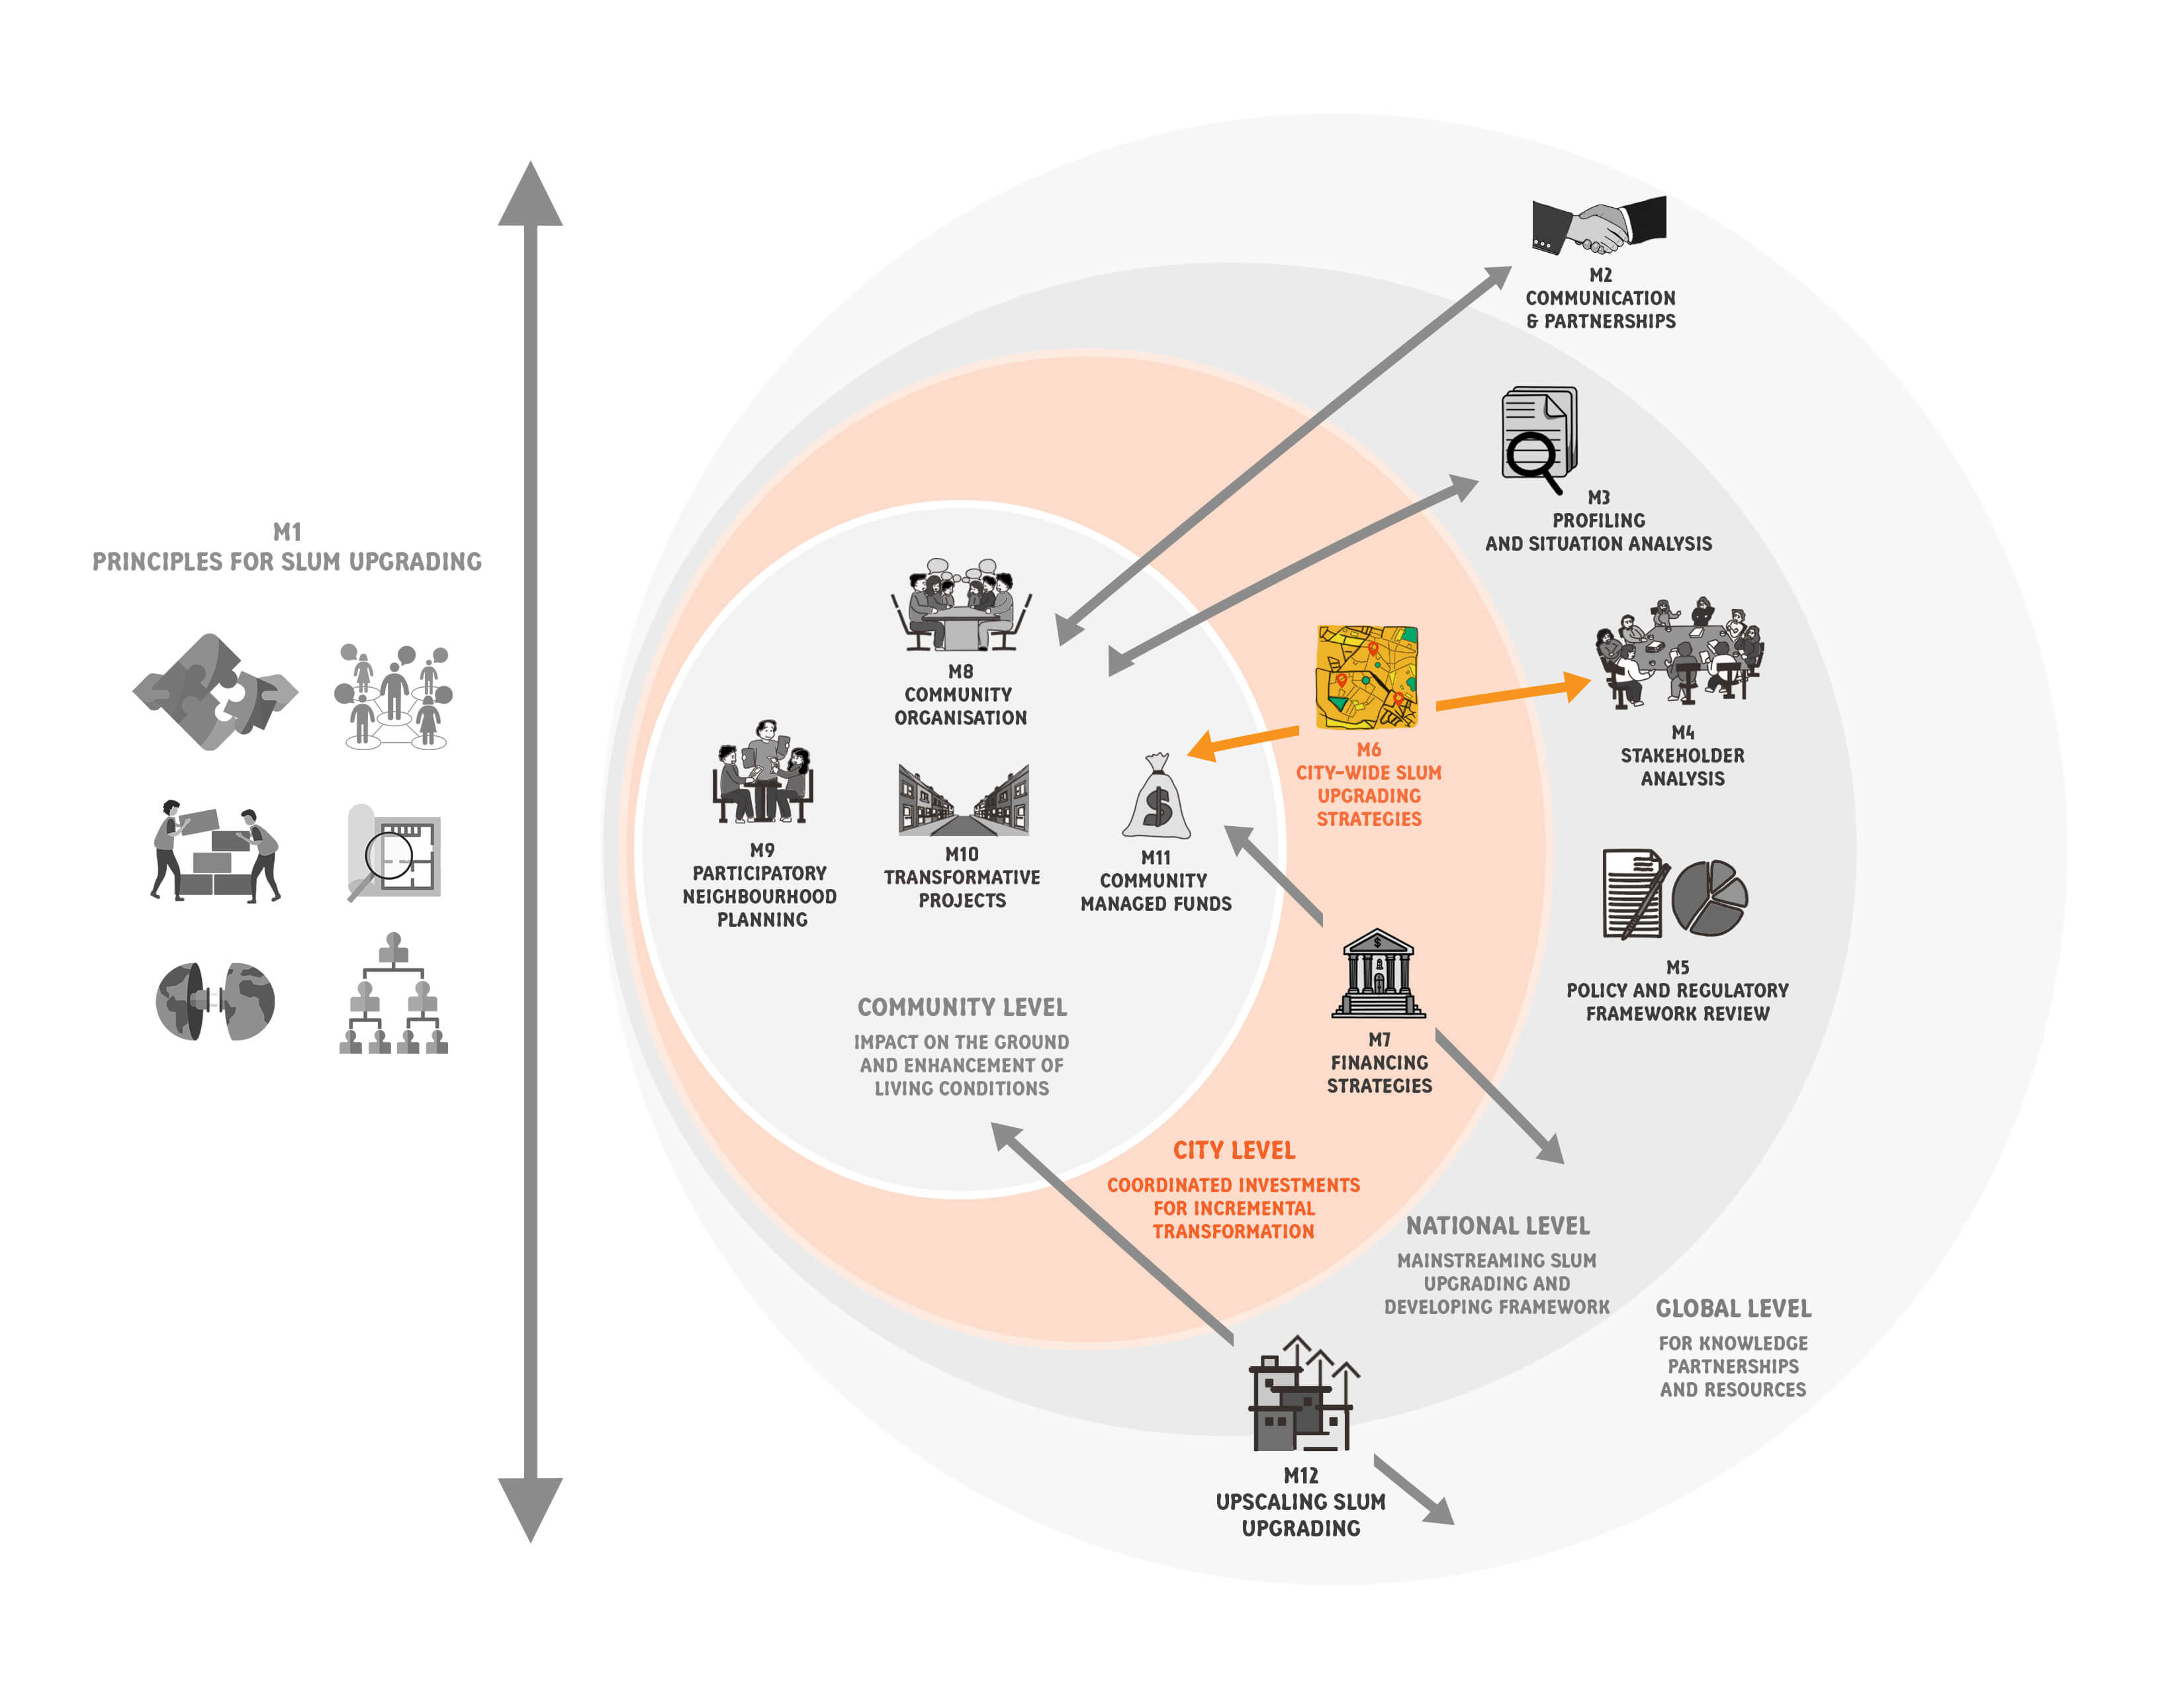 Module 06 - City-Wide Slum Upgrading Strategies